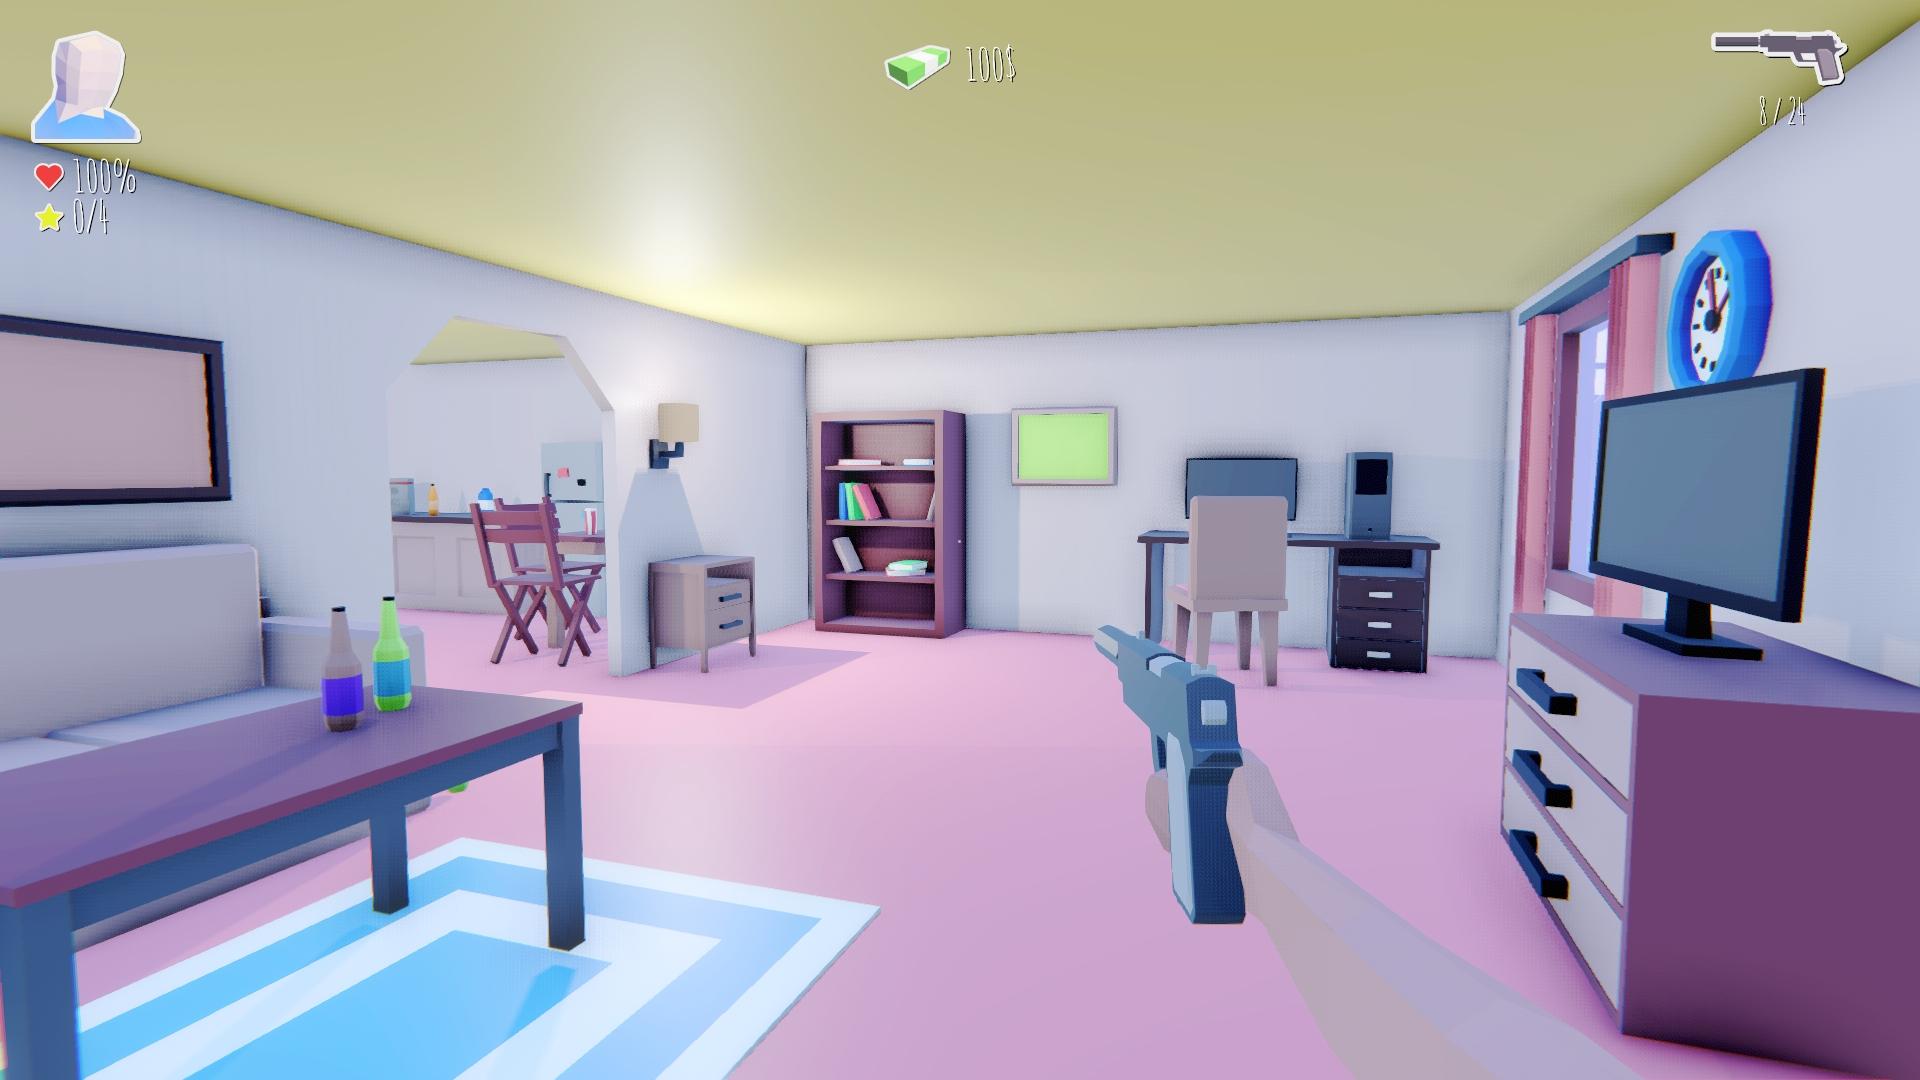 KHAiHOM.com - Dude Simulator 2